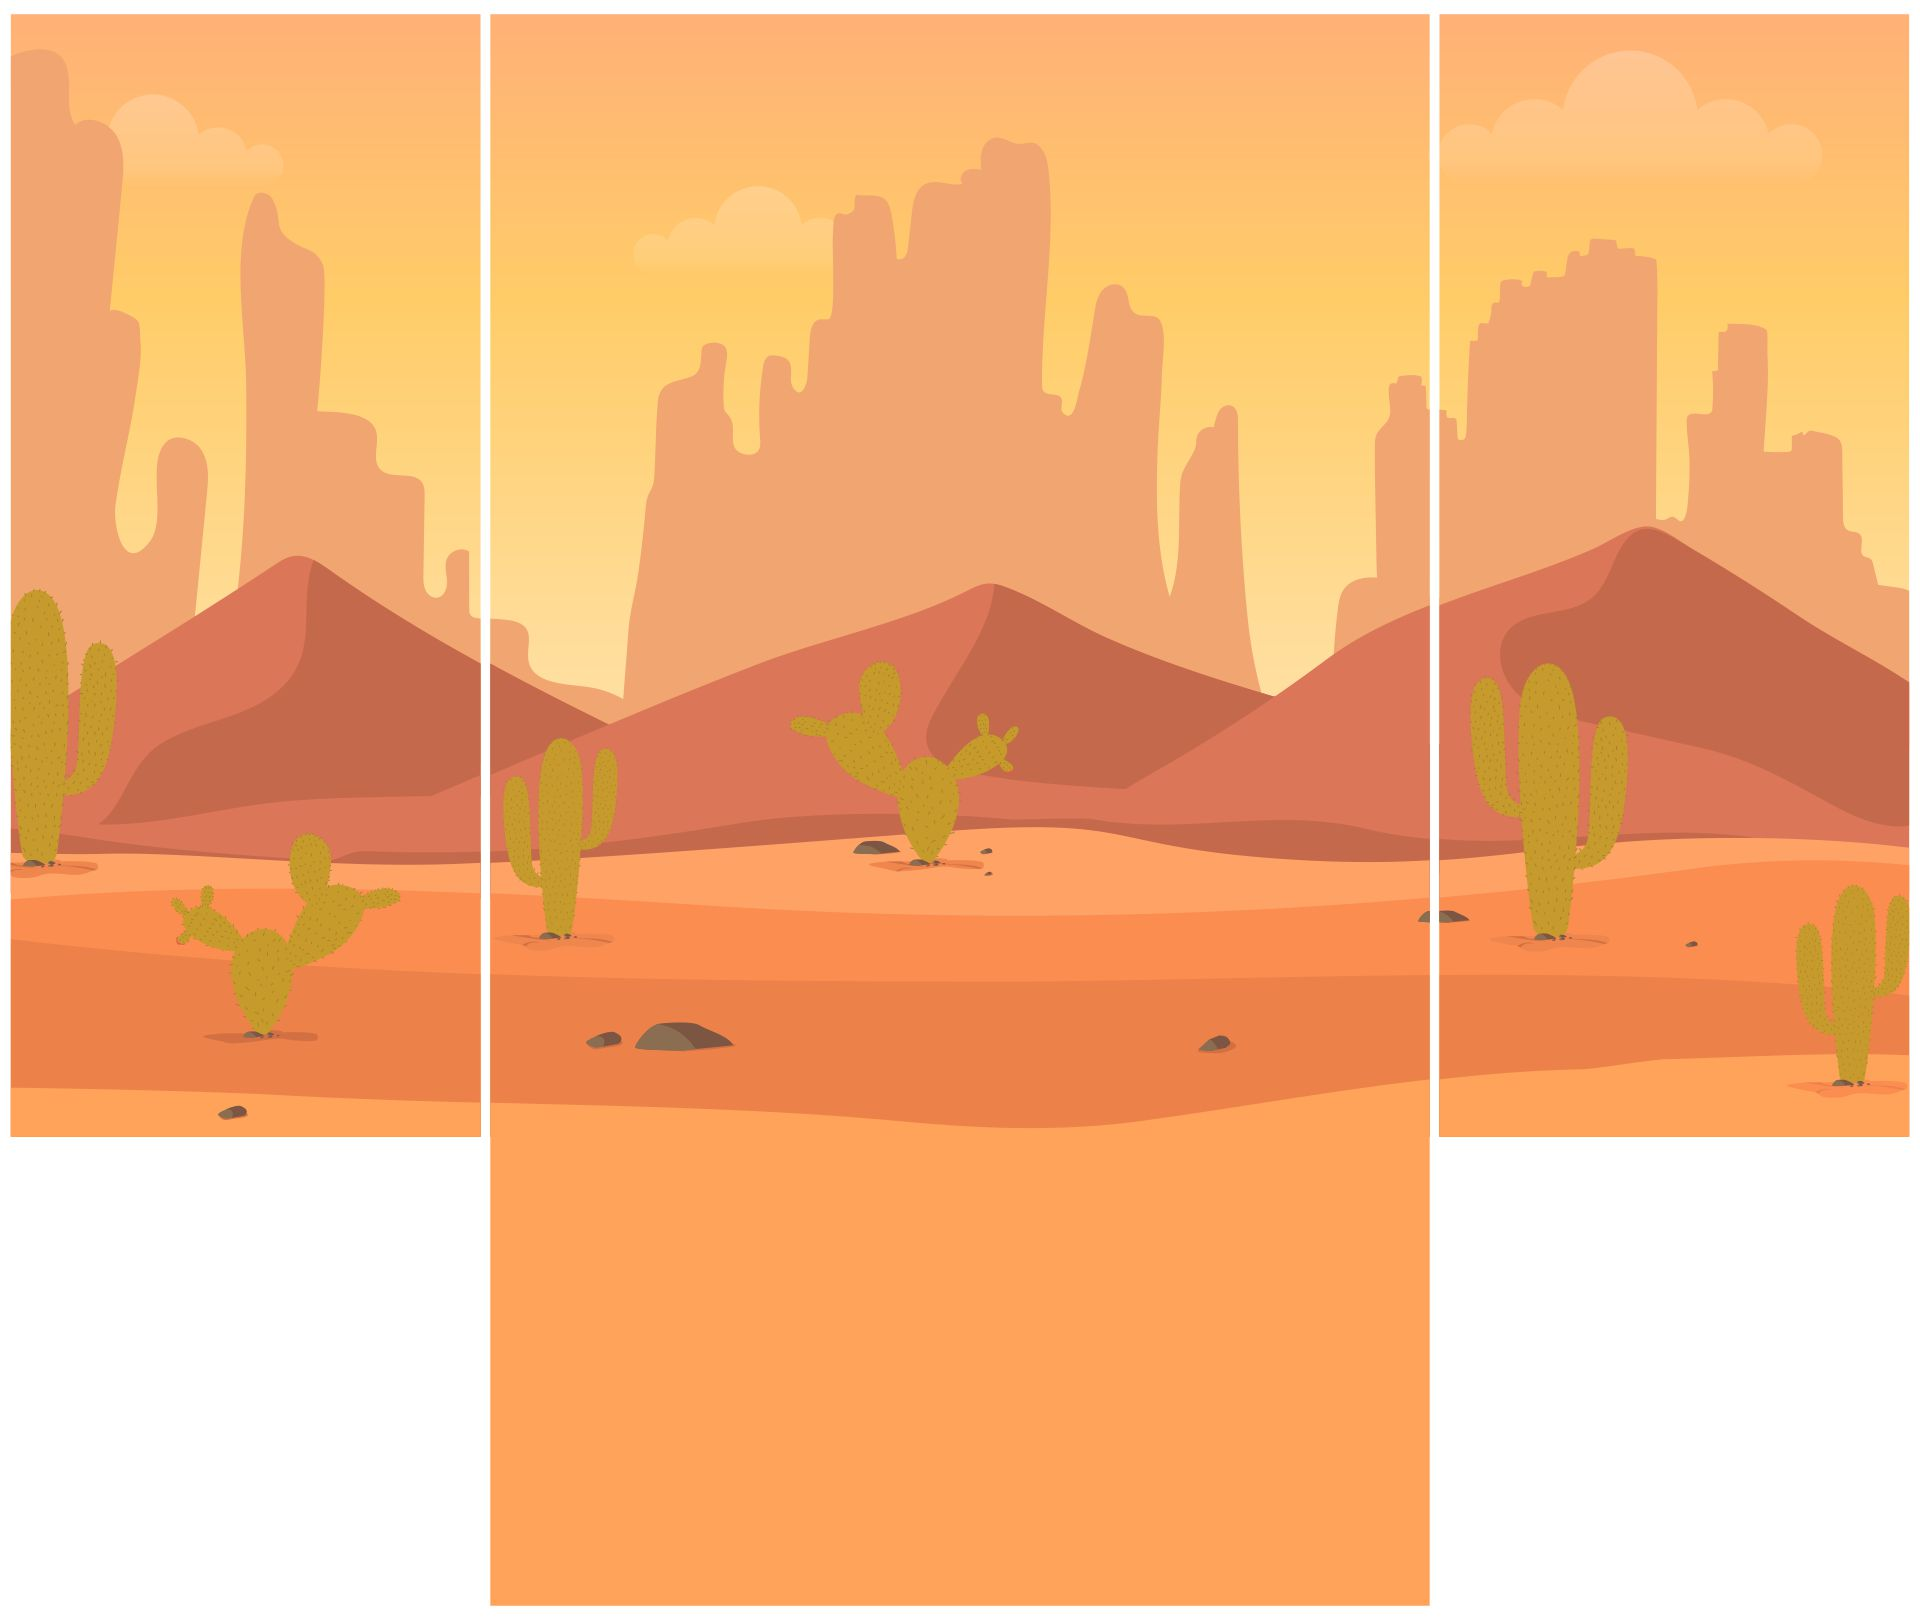 Desert Diorama Background Printable